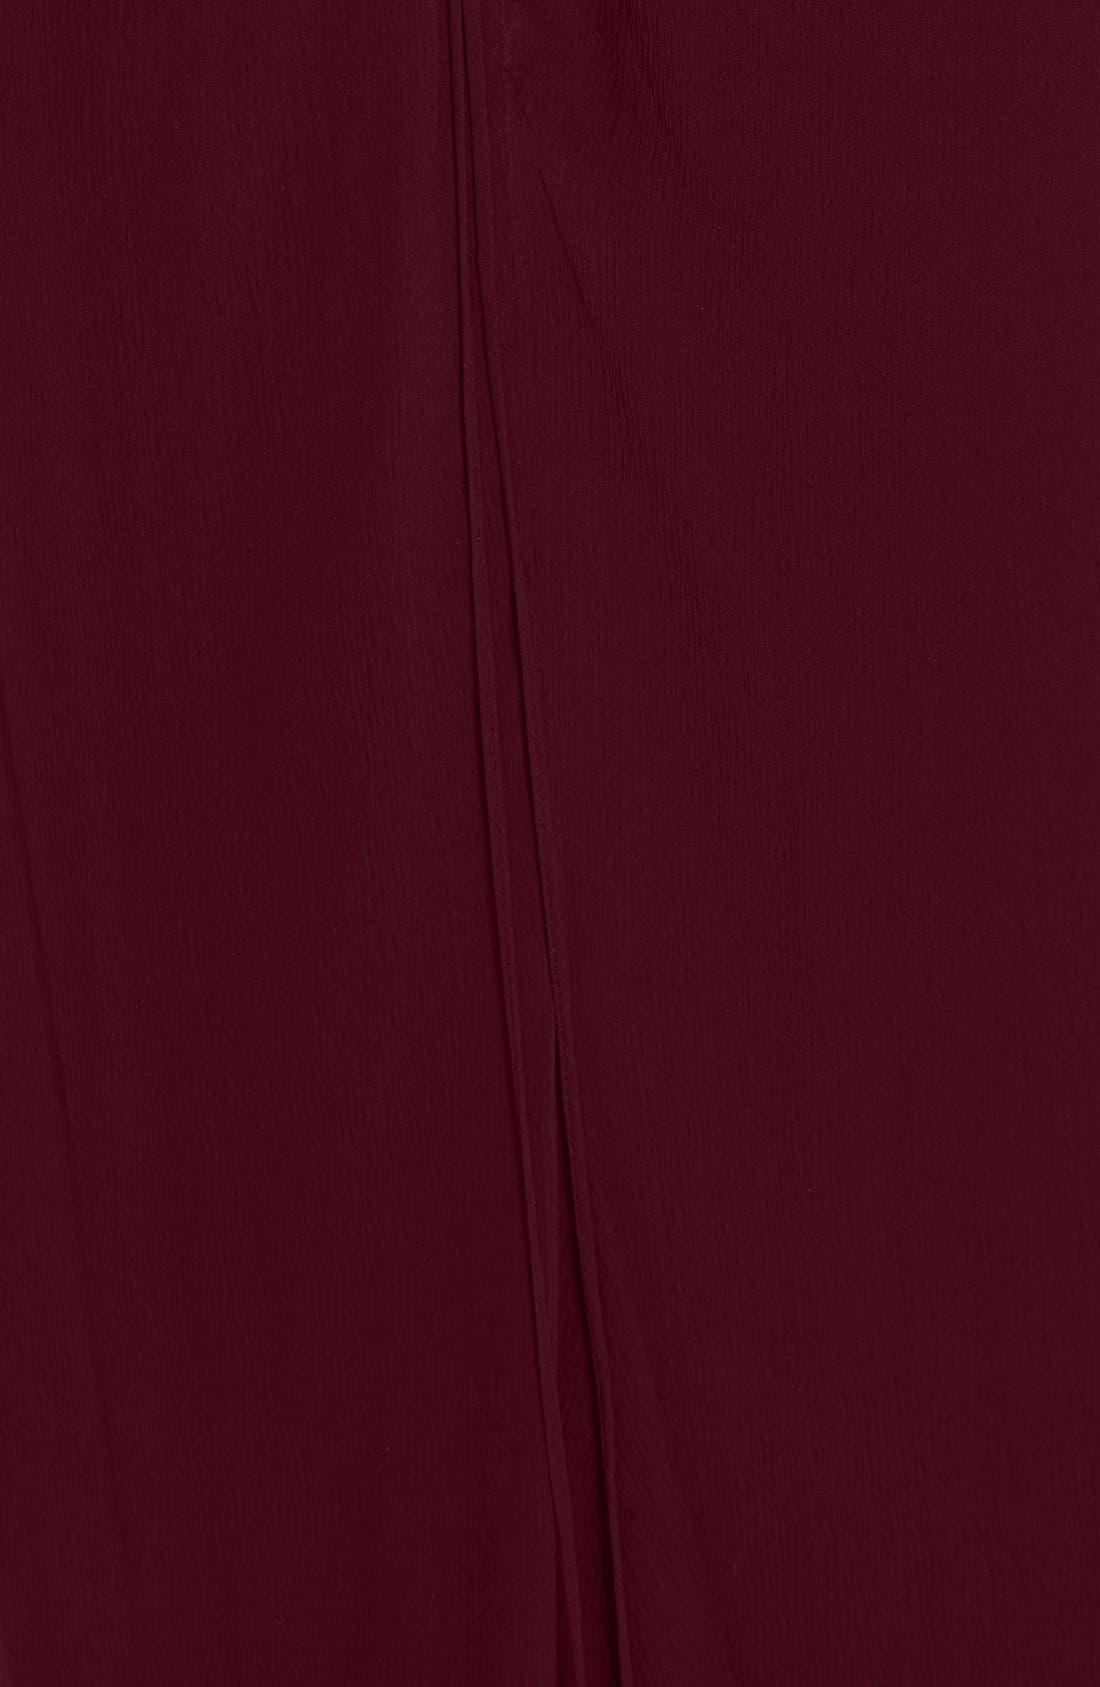 Ruffle Detail Silk Chiffon V-Neck Gown,                             Alternate thumbnail 8, color,